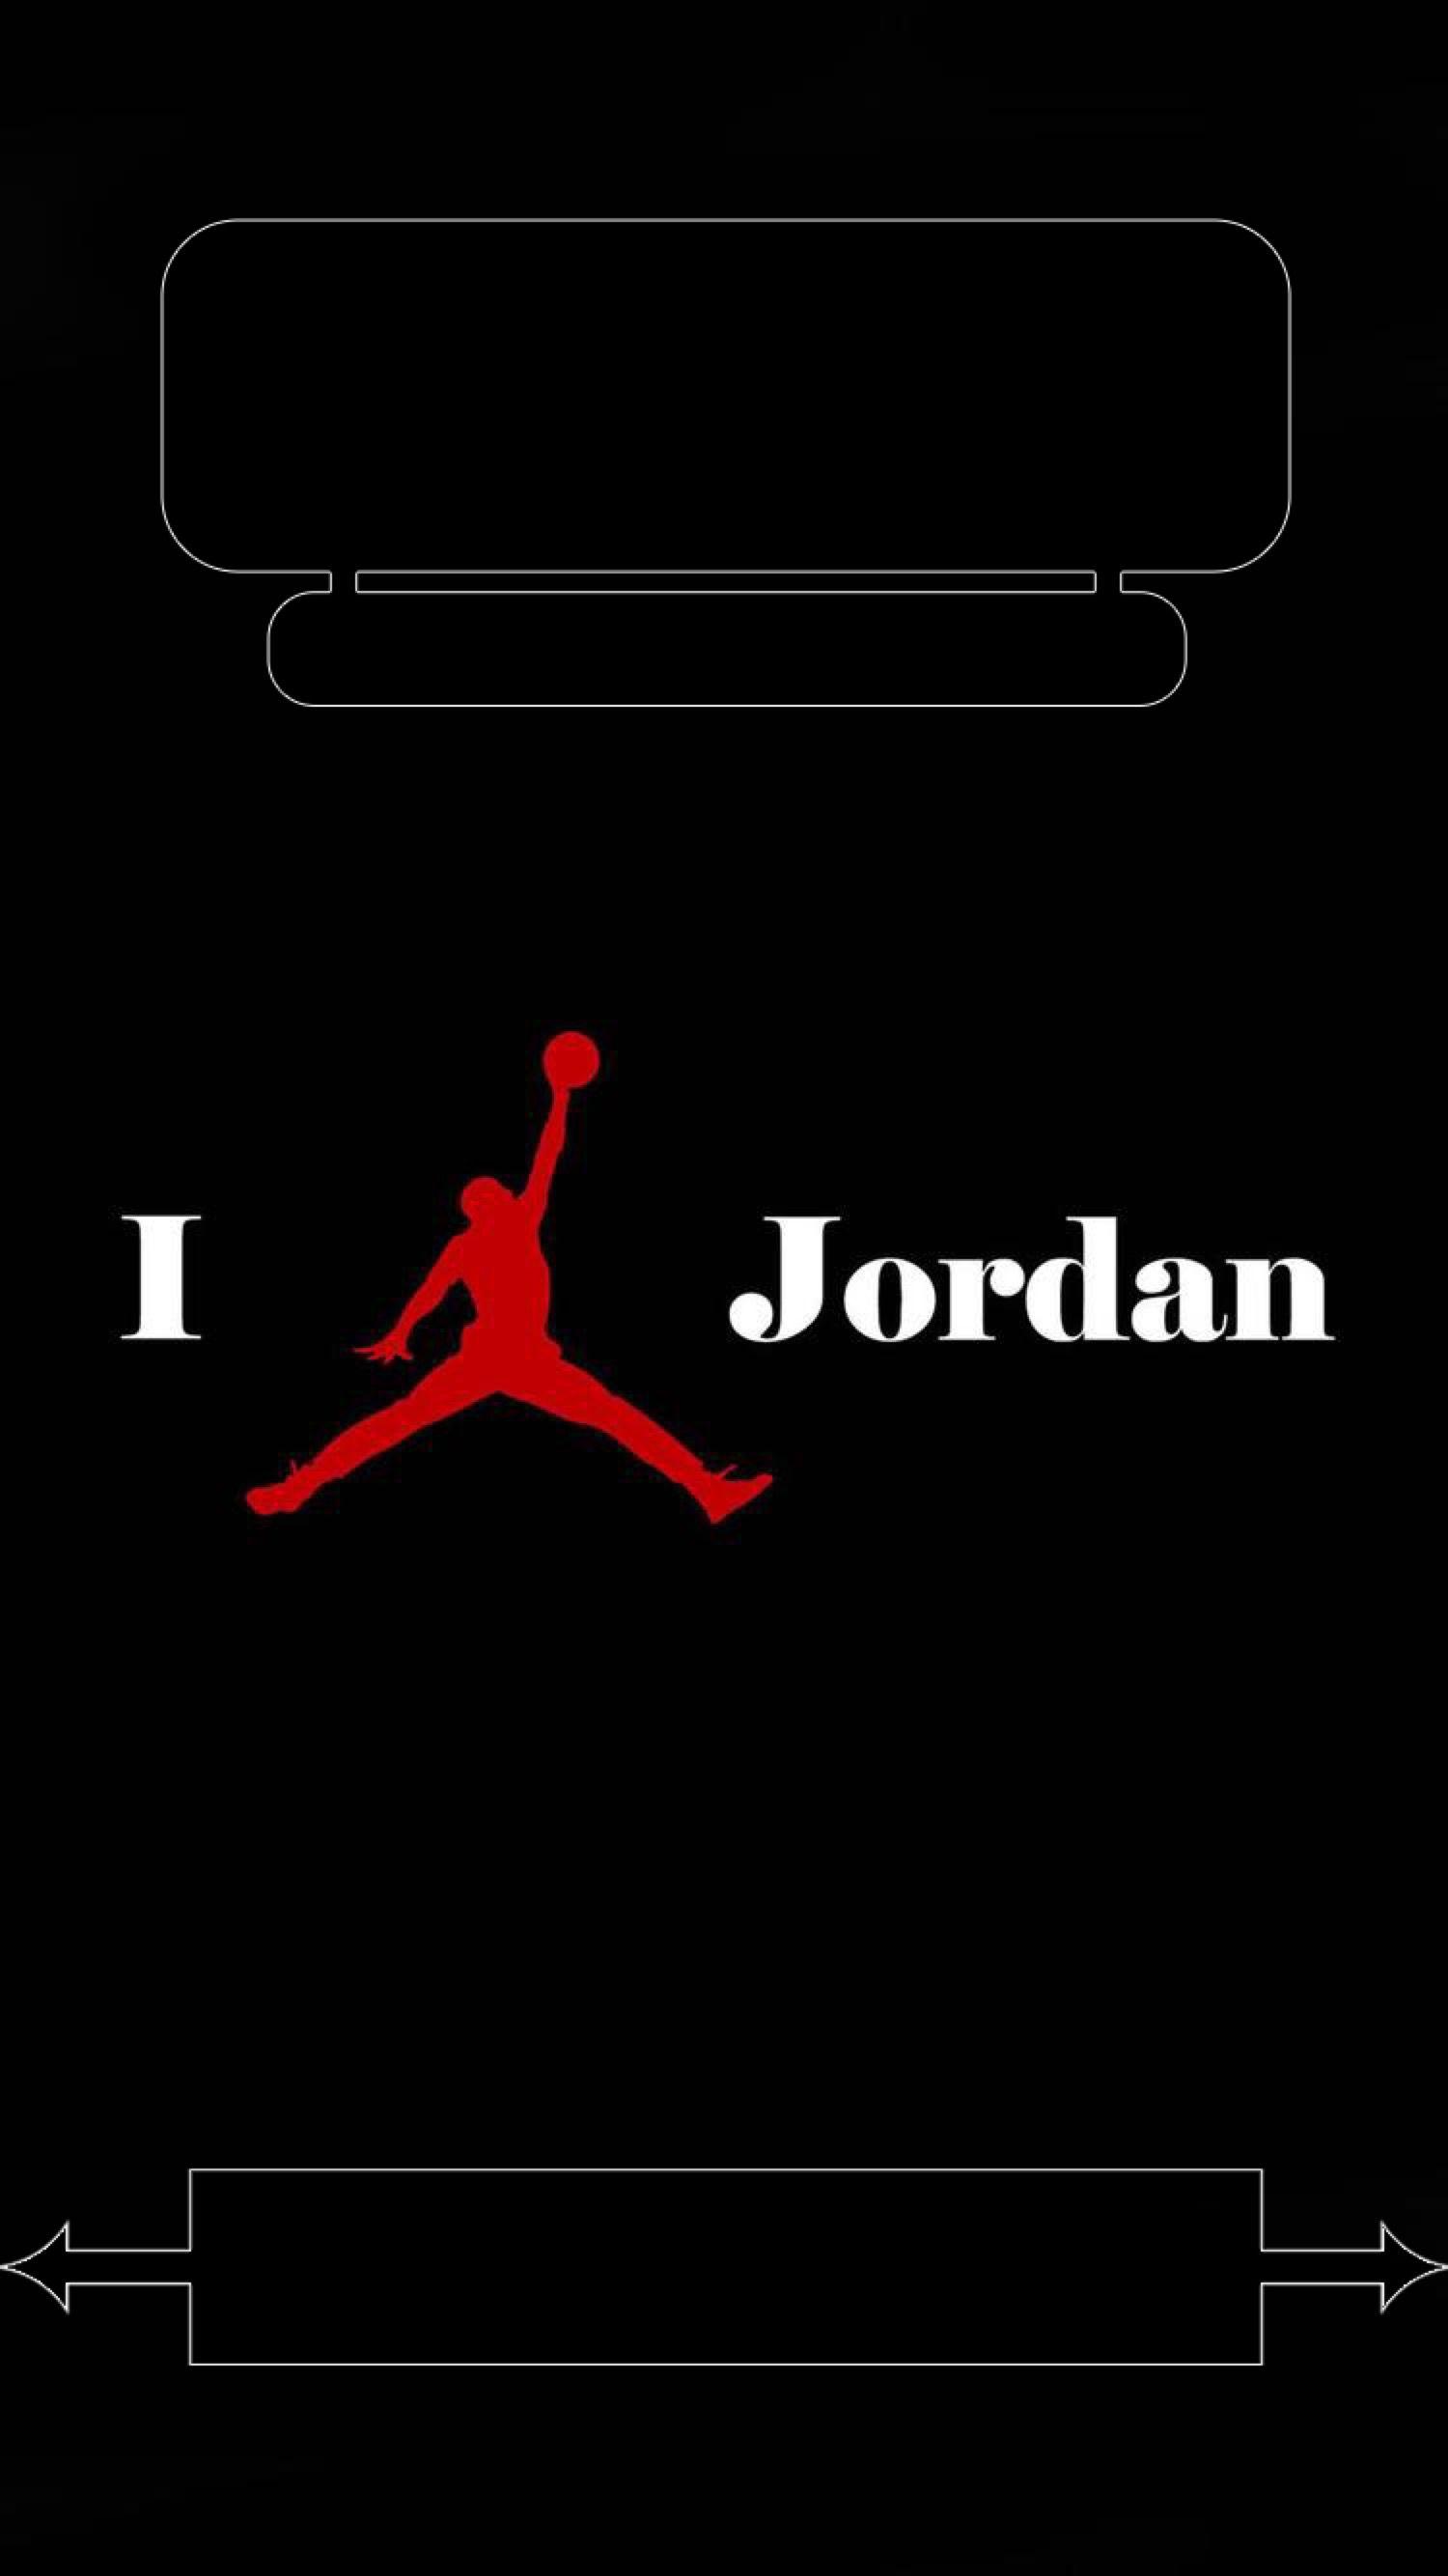 Tap And Get The Free App Lockscreens Art Creative Basketball Michael Jordan I Love This Game Shortcut Red Hd Iphone 6 Lock Screen